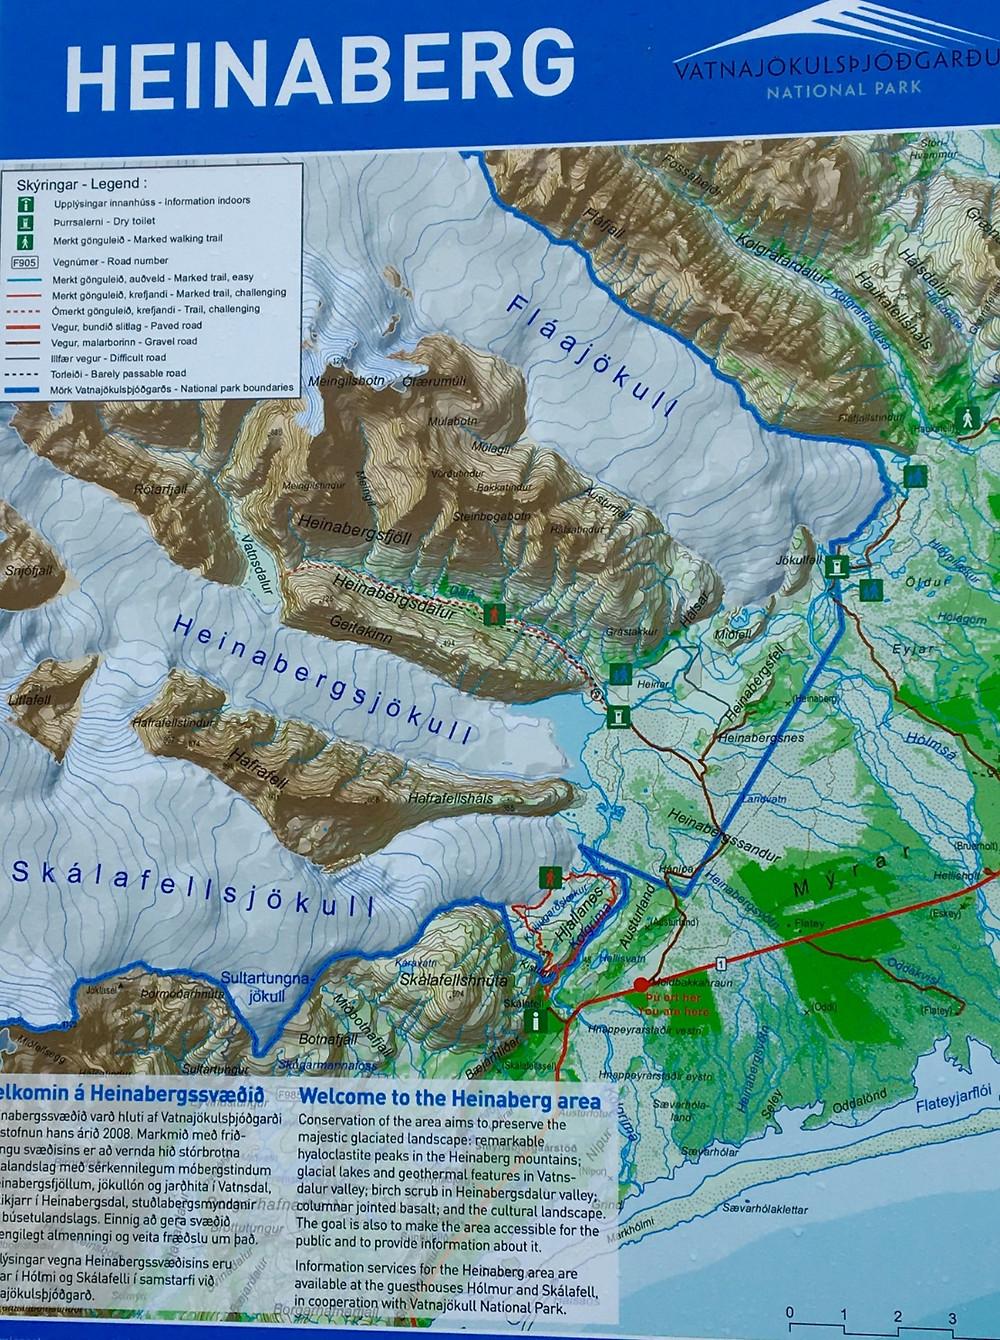 Map of the 3 major glaciers in Myrar area of Vatnajokulsjodgardur National Park